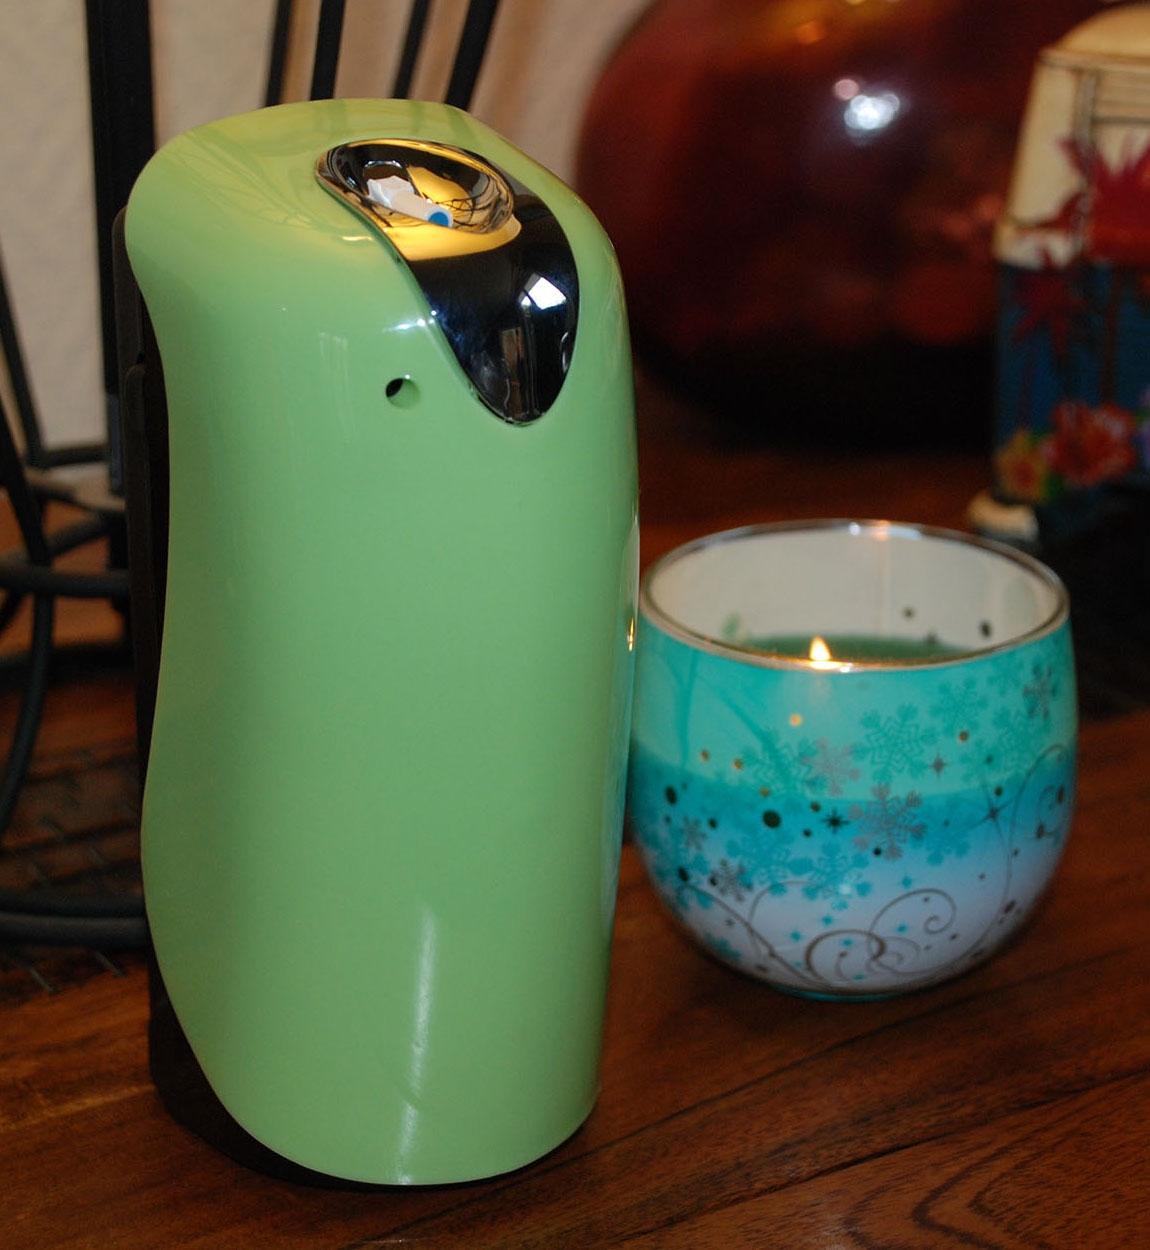 diffuseur de parfum automatique prodifa mini basic vert. Black Bedroom Furniture Sets. Home Design Ideas